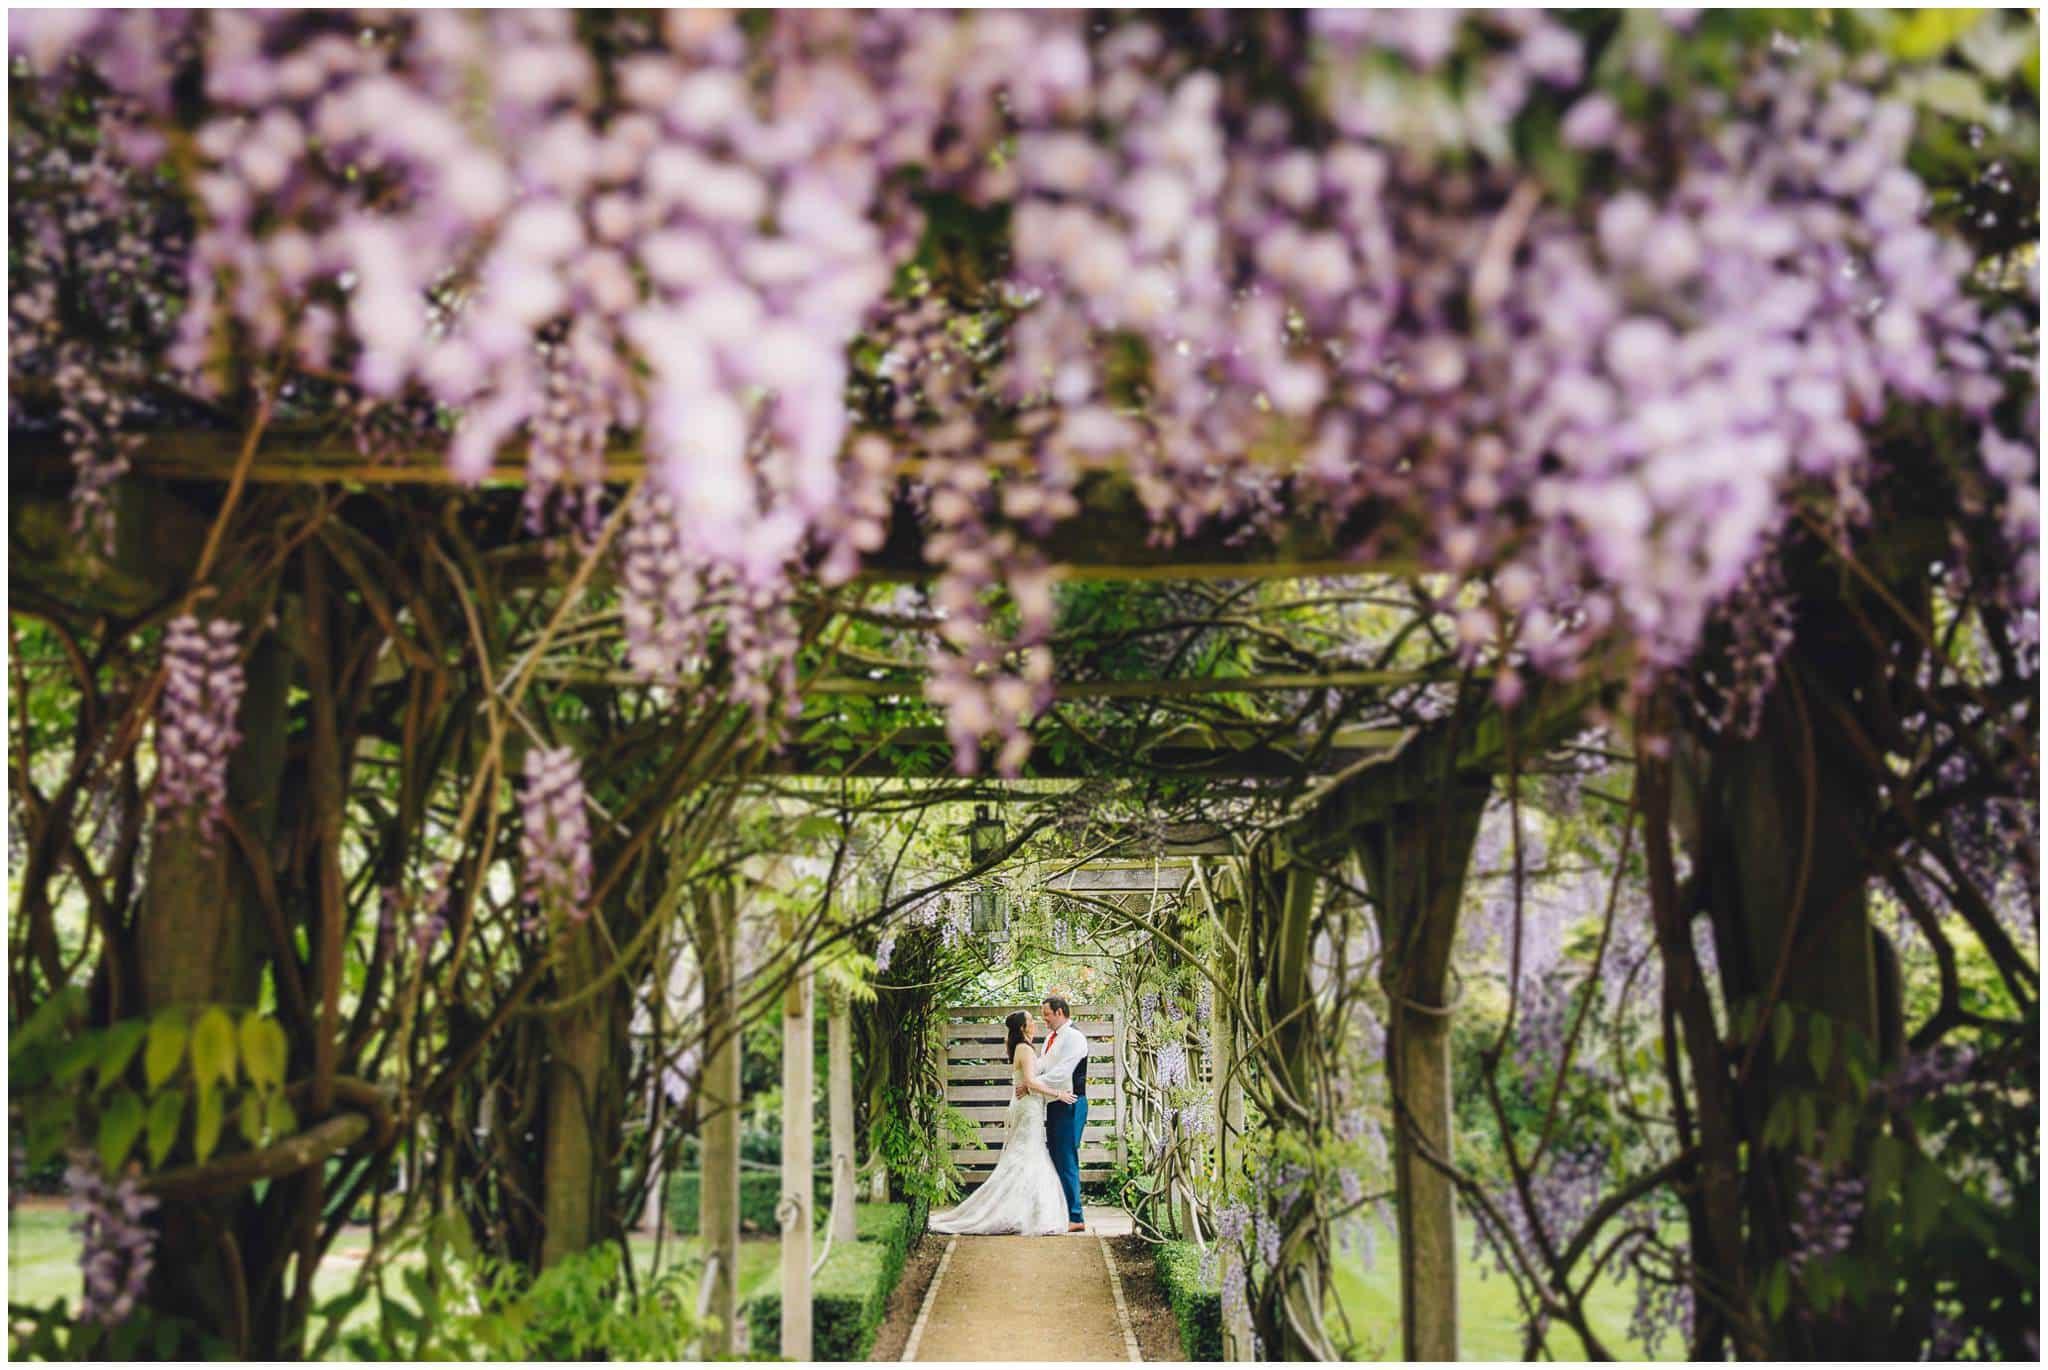 The Tythe Barn Wedding Photographer – Mat & Nikki